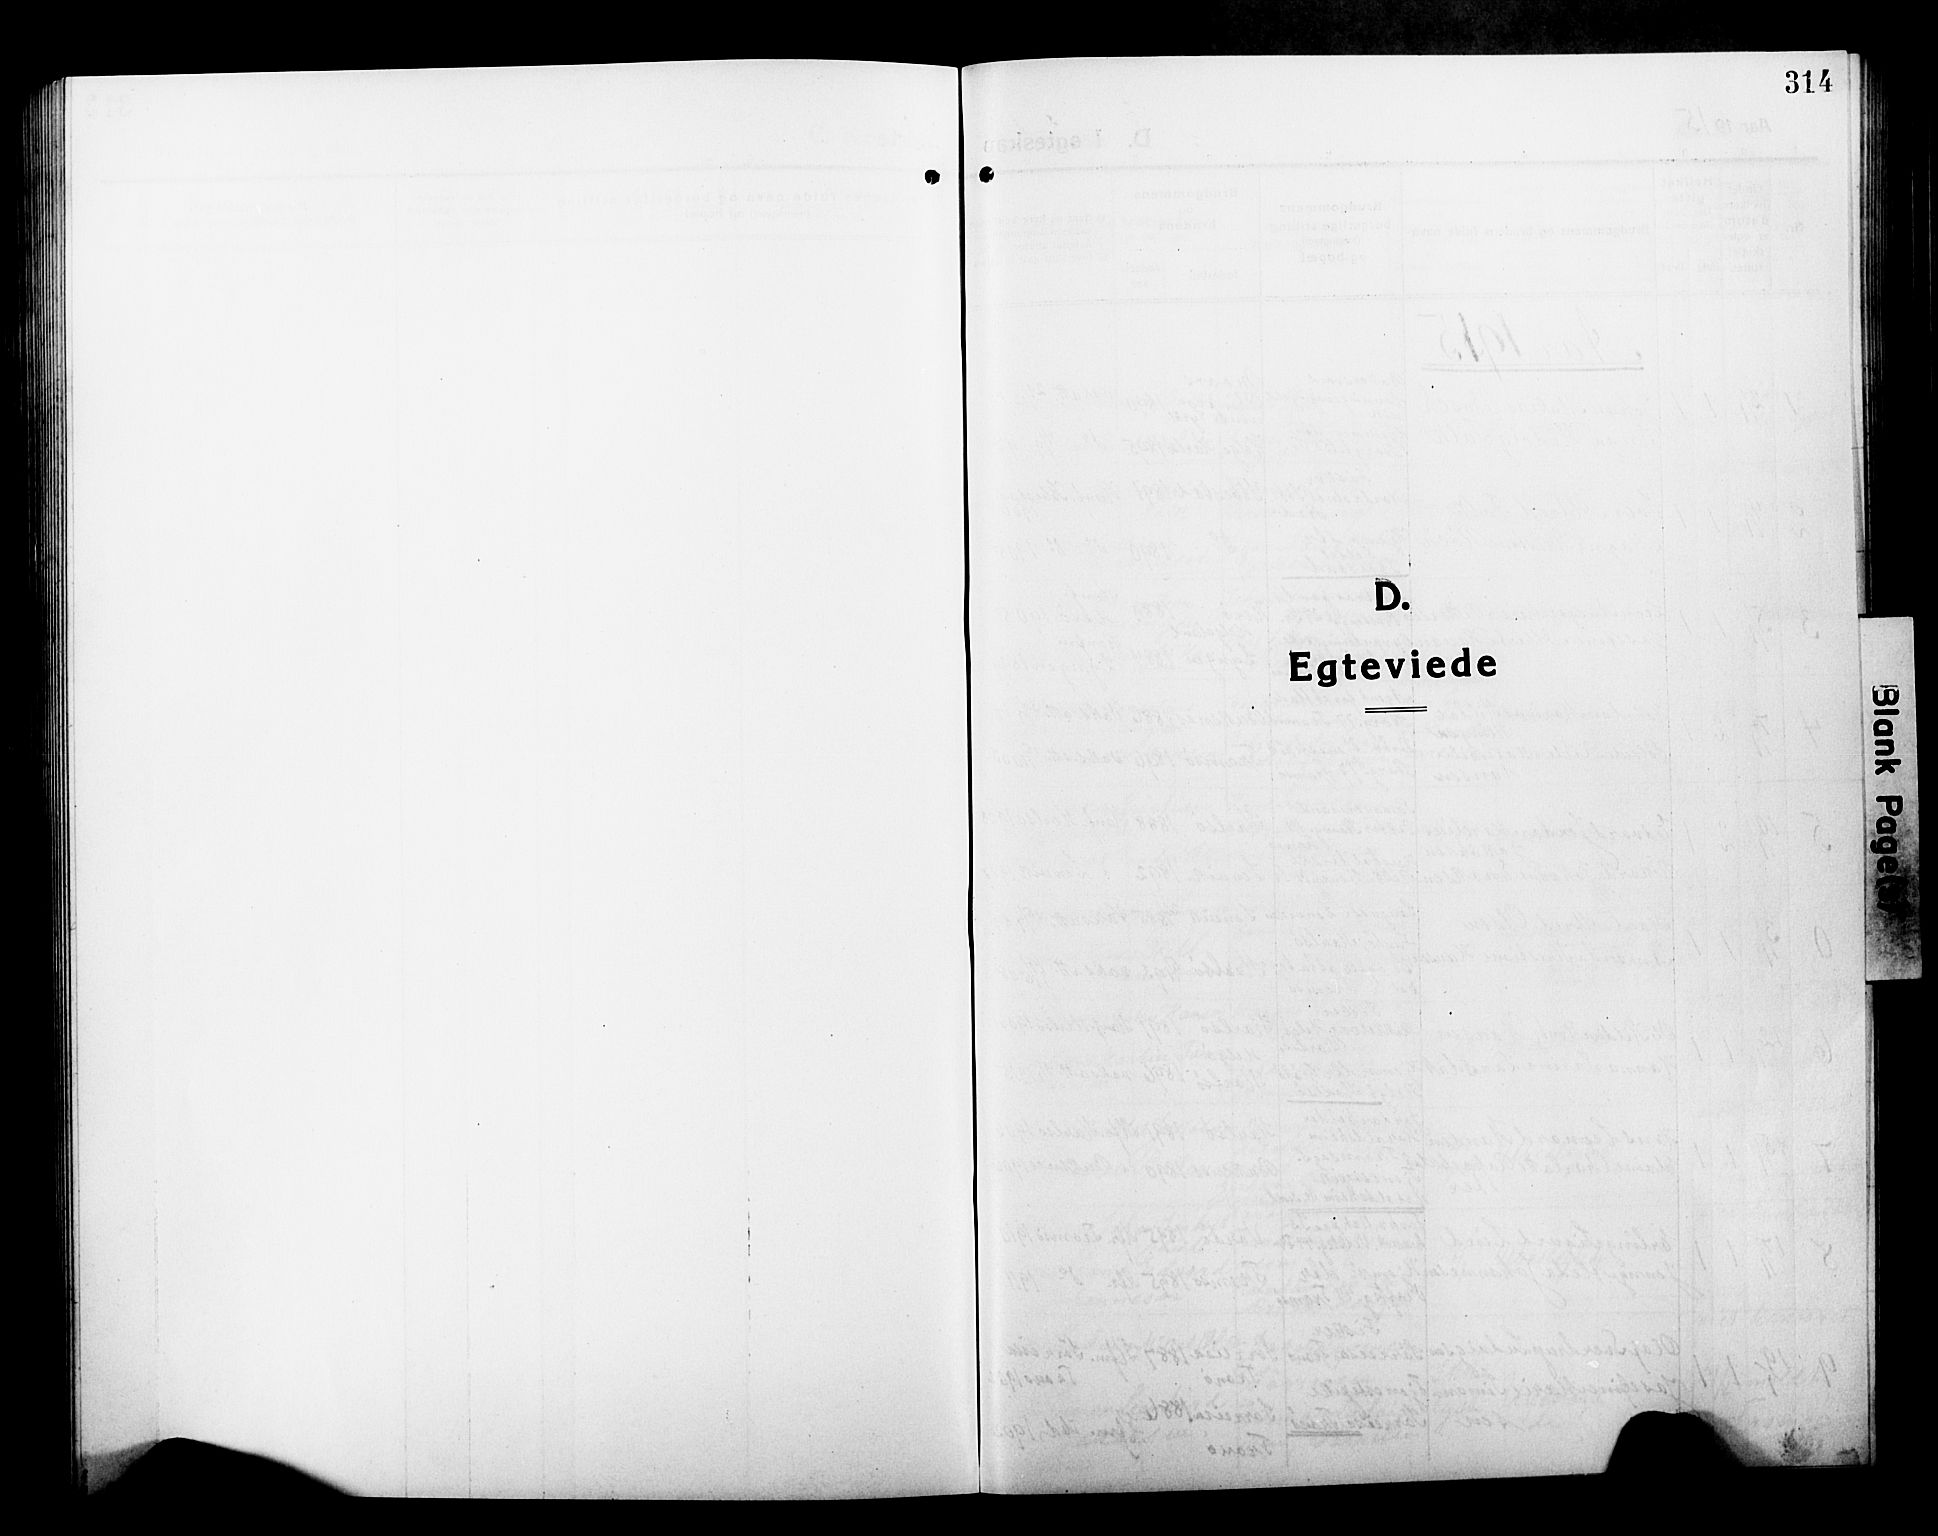 SATØ, Tromsø sokneprestkontor/stiftsprosti/domprosti, G/Gb/L0009klokker: Klokkerbok nr. 9, 1915-1925, s. 314